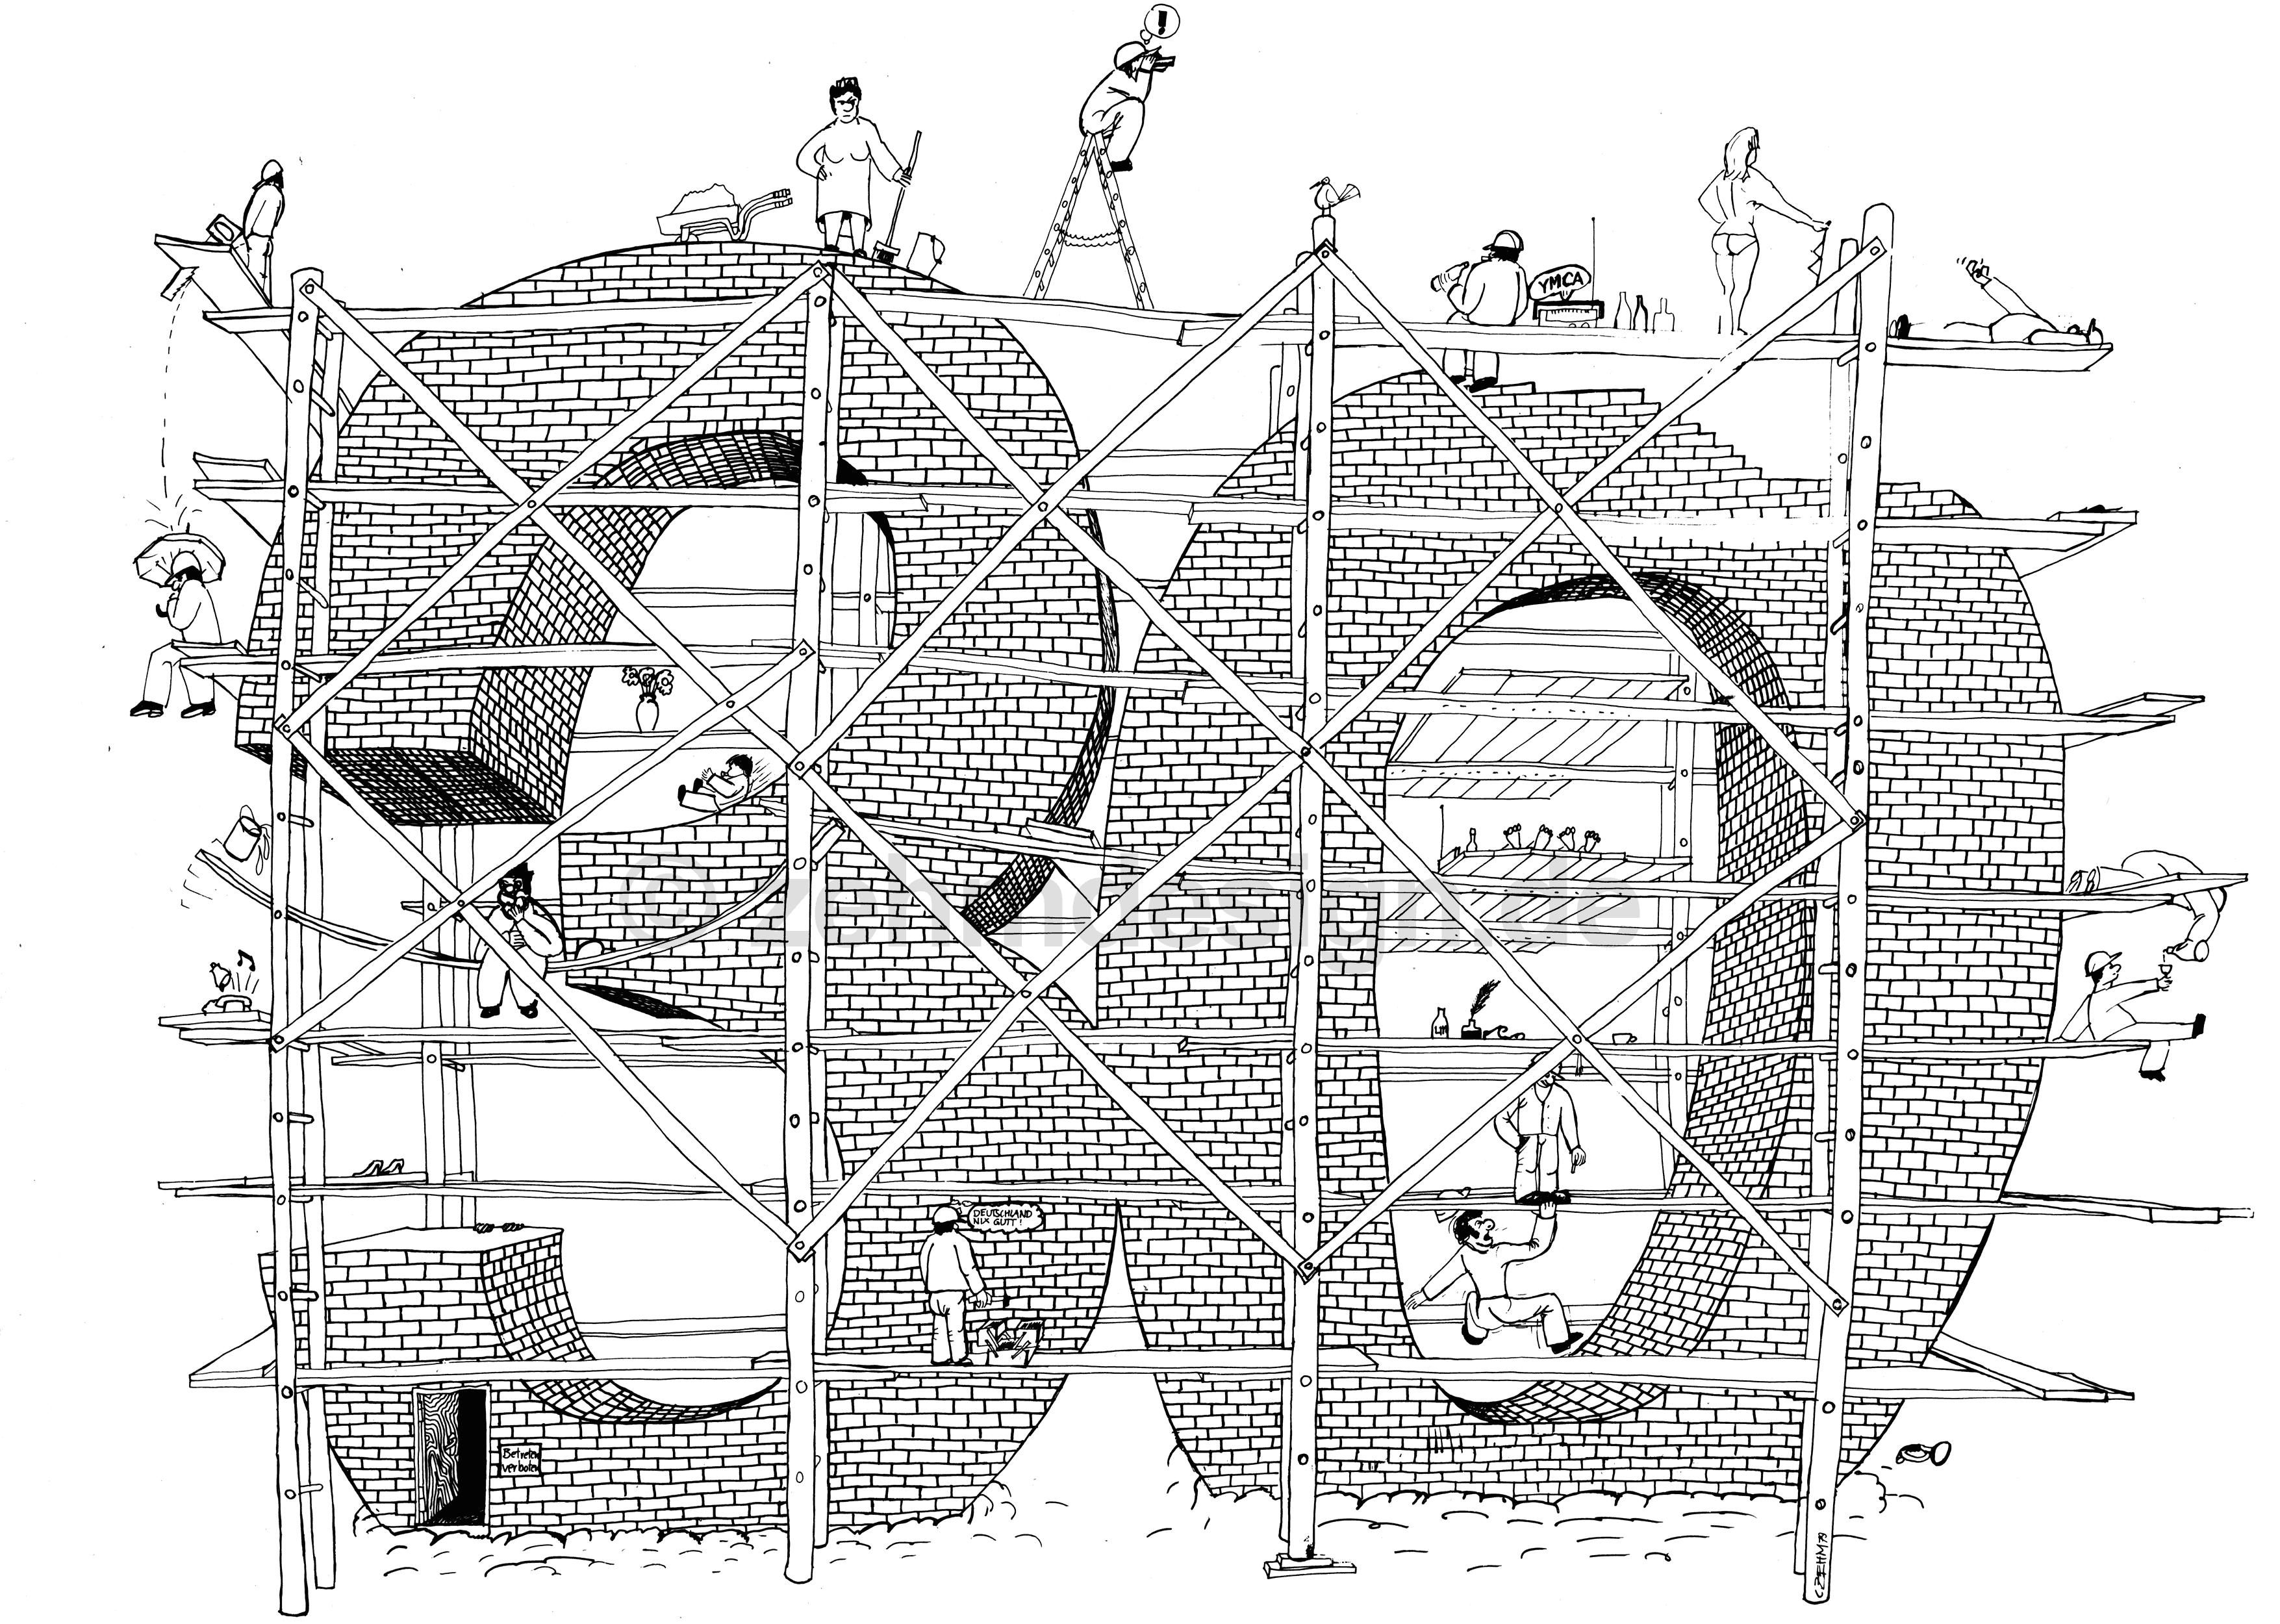 Zehm Design Cartoon Baustelle 1979